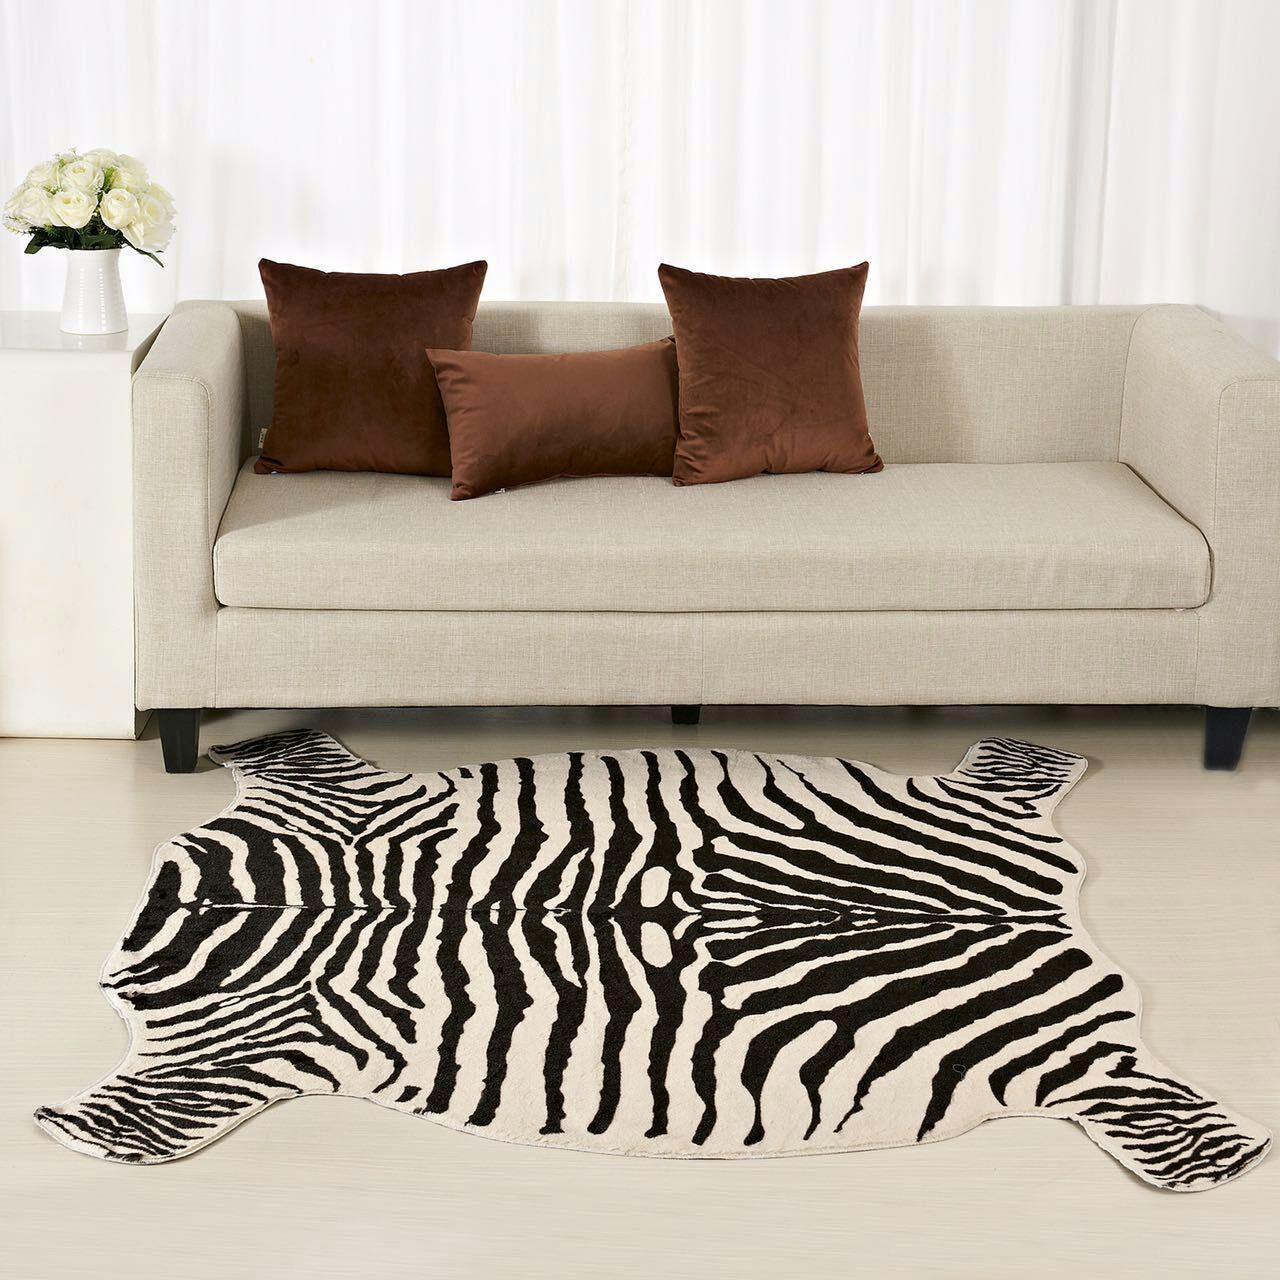 Zebra/Cow Printed Carpet PV Velvet Imitation Leather Rugs Animal Skins  Natural Shape Carpet Living